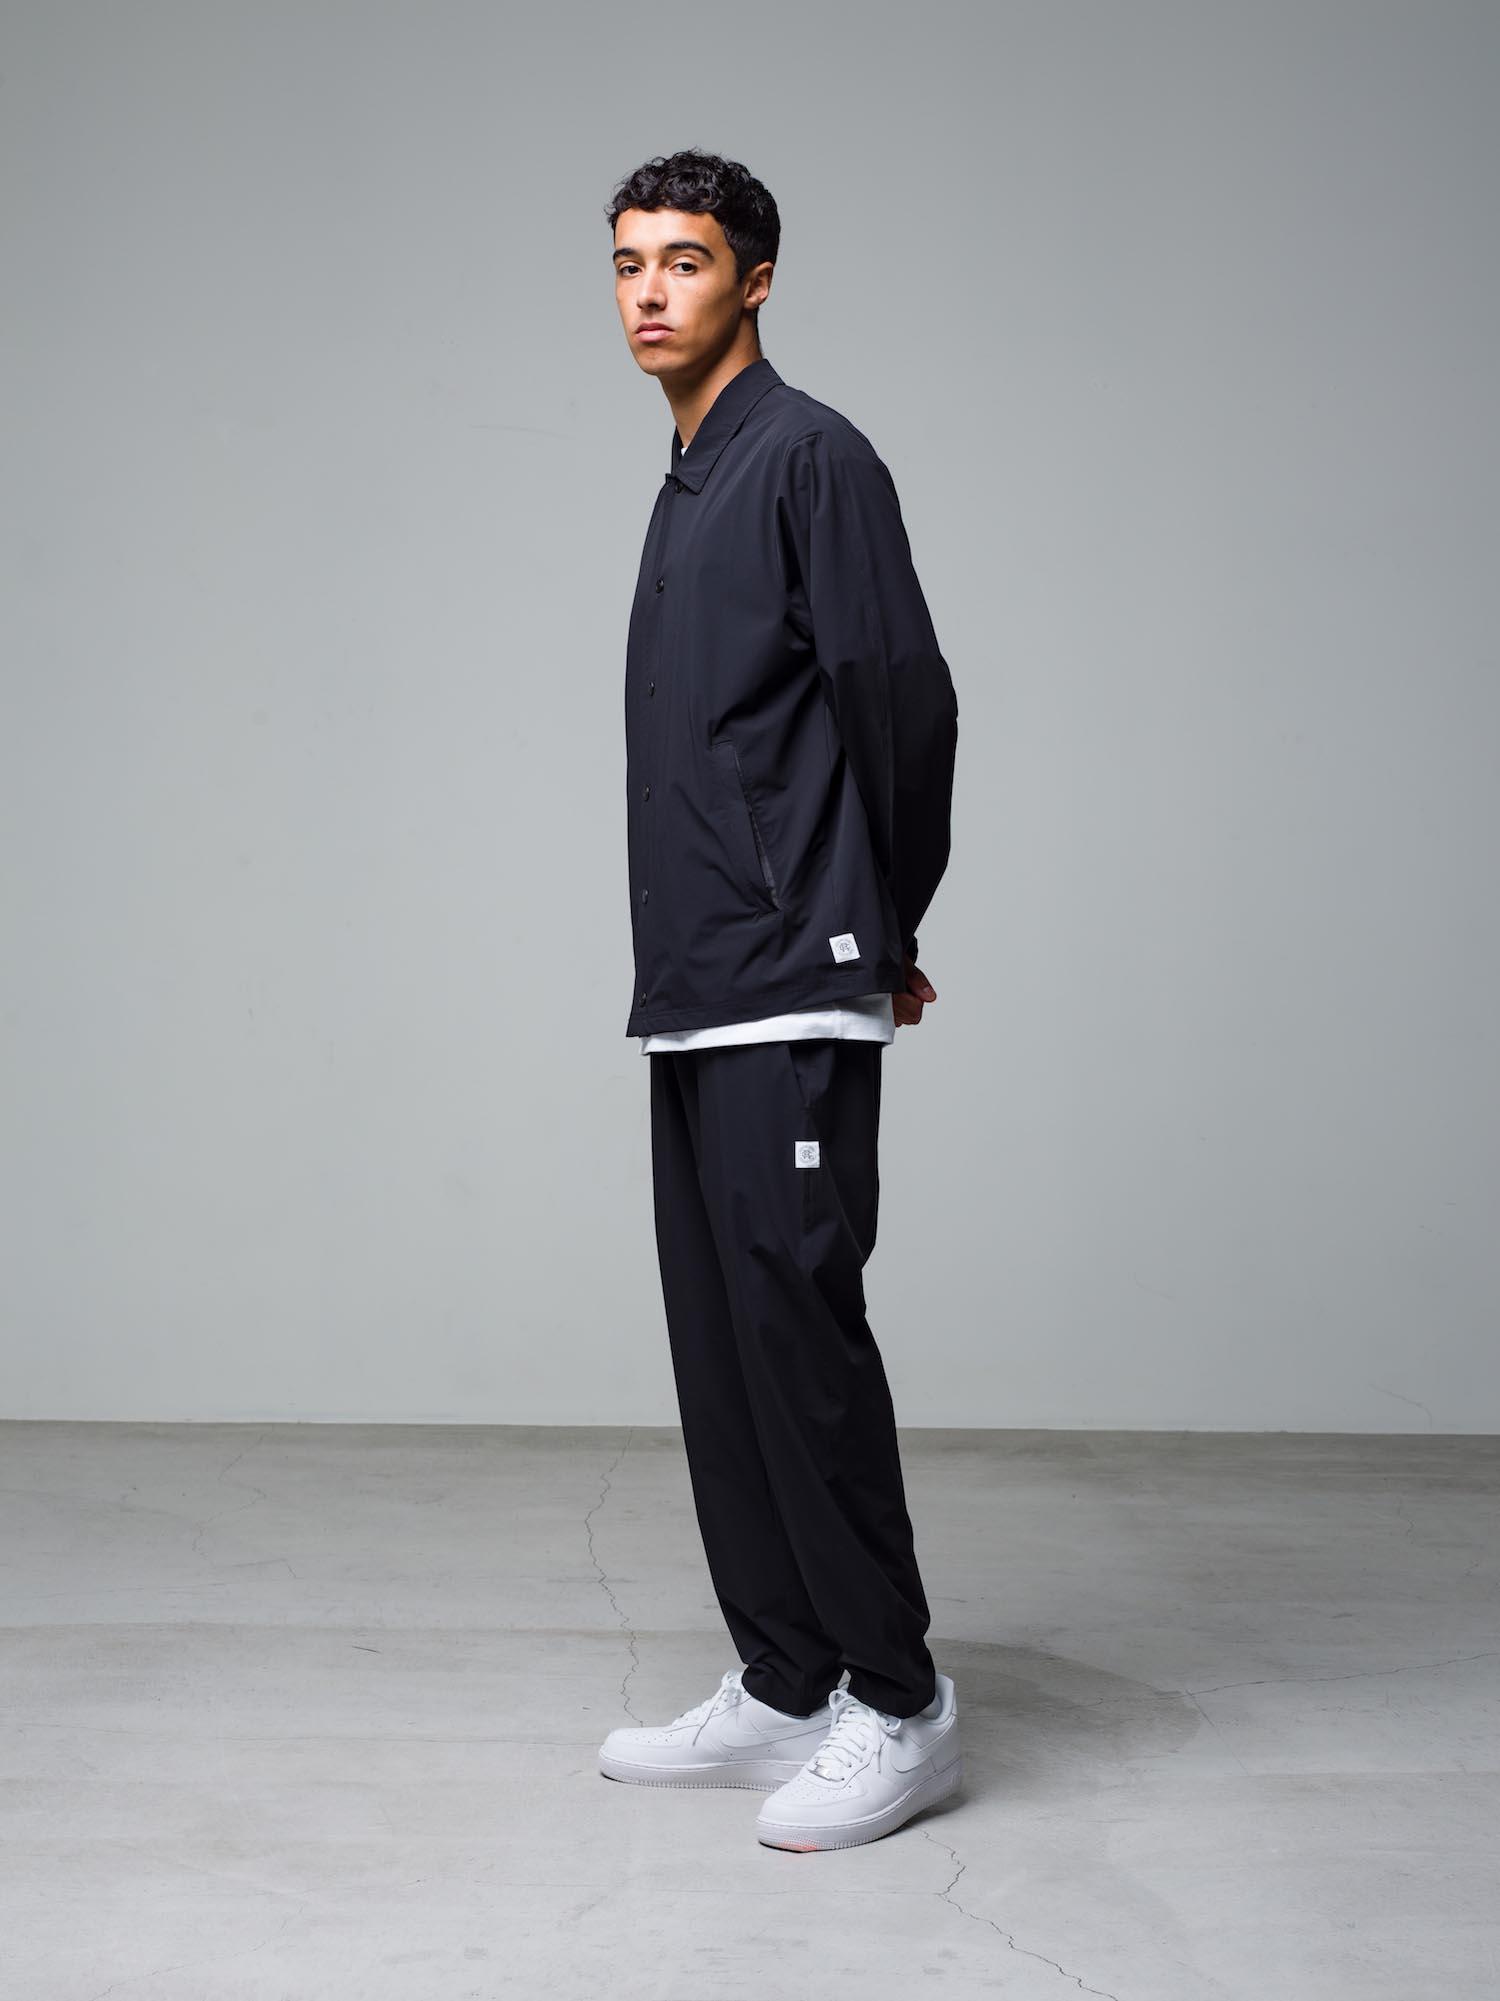 21) Jacket ¥36,300  Inner ¥8,800  Pants ¥31,900  Shoes ¥11,000